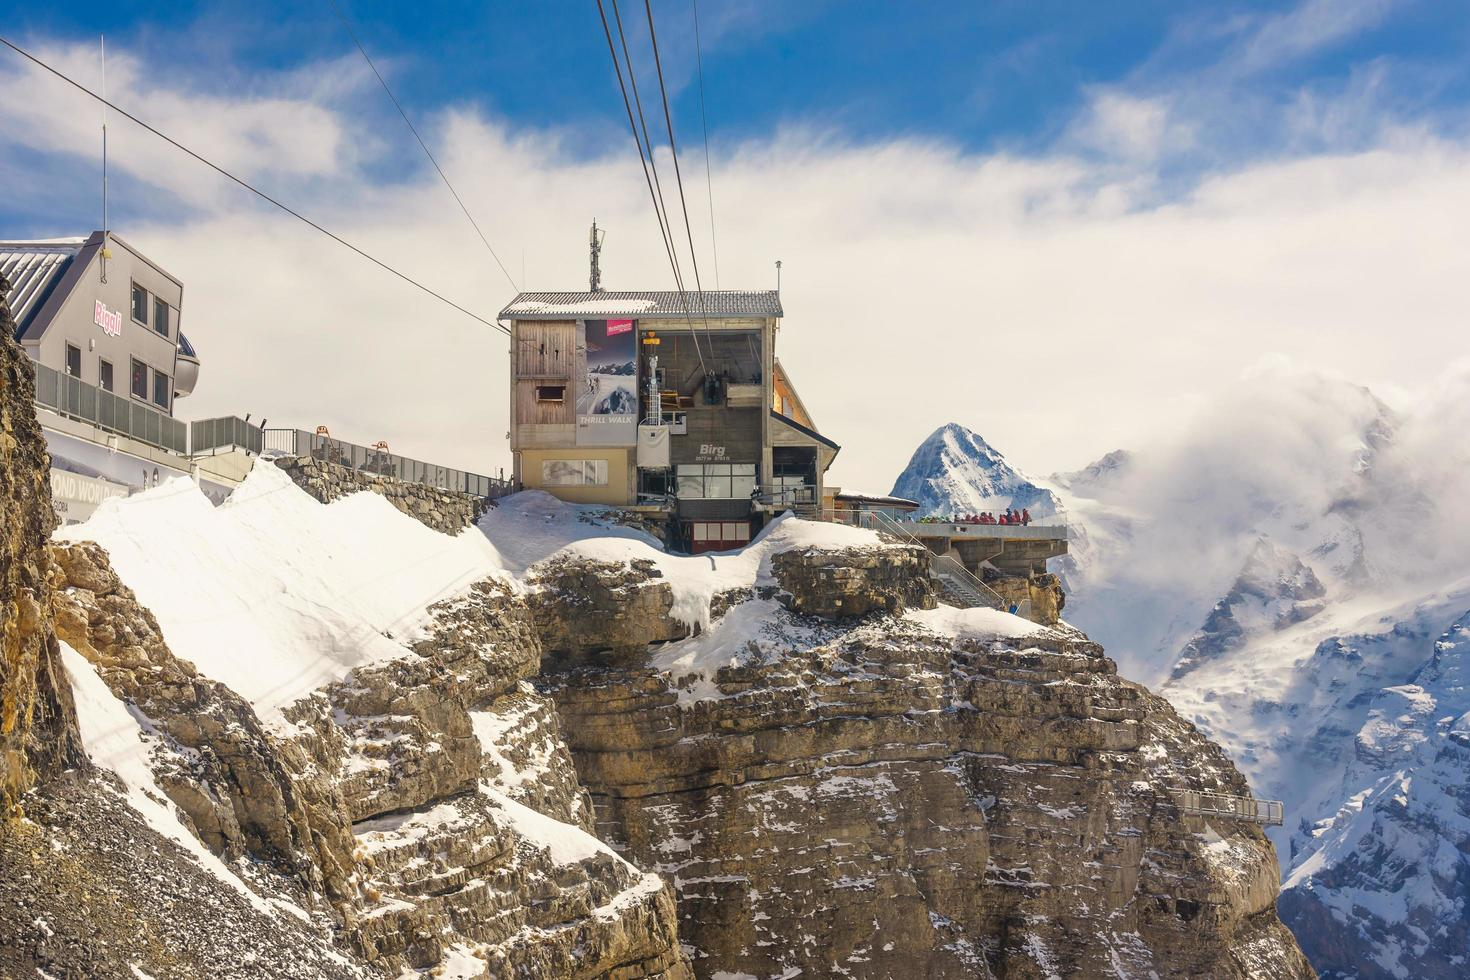 Birg station in the Swiss Alps in Murren photo